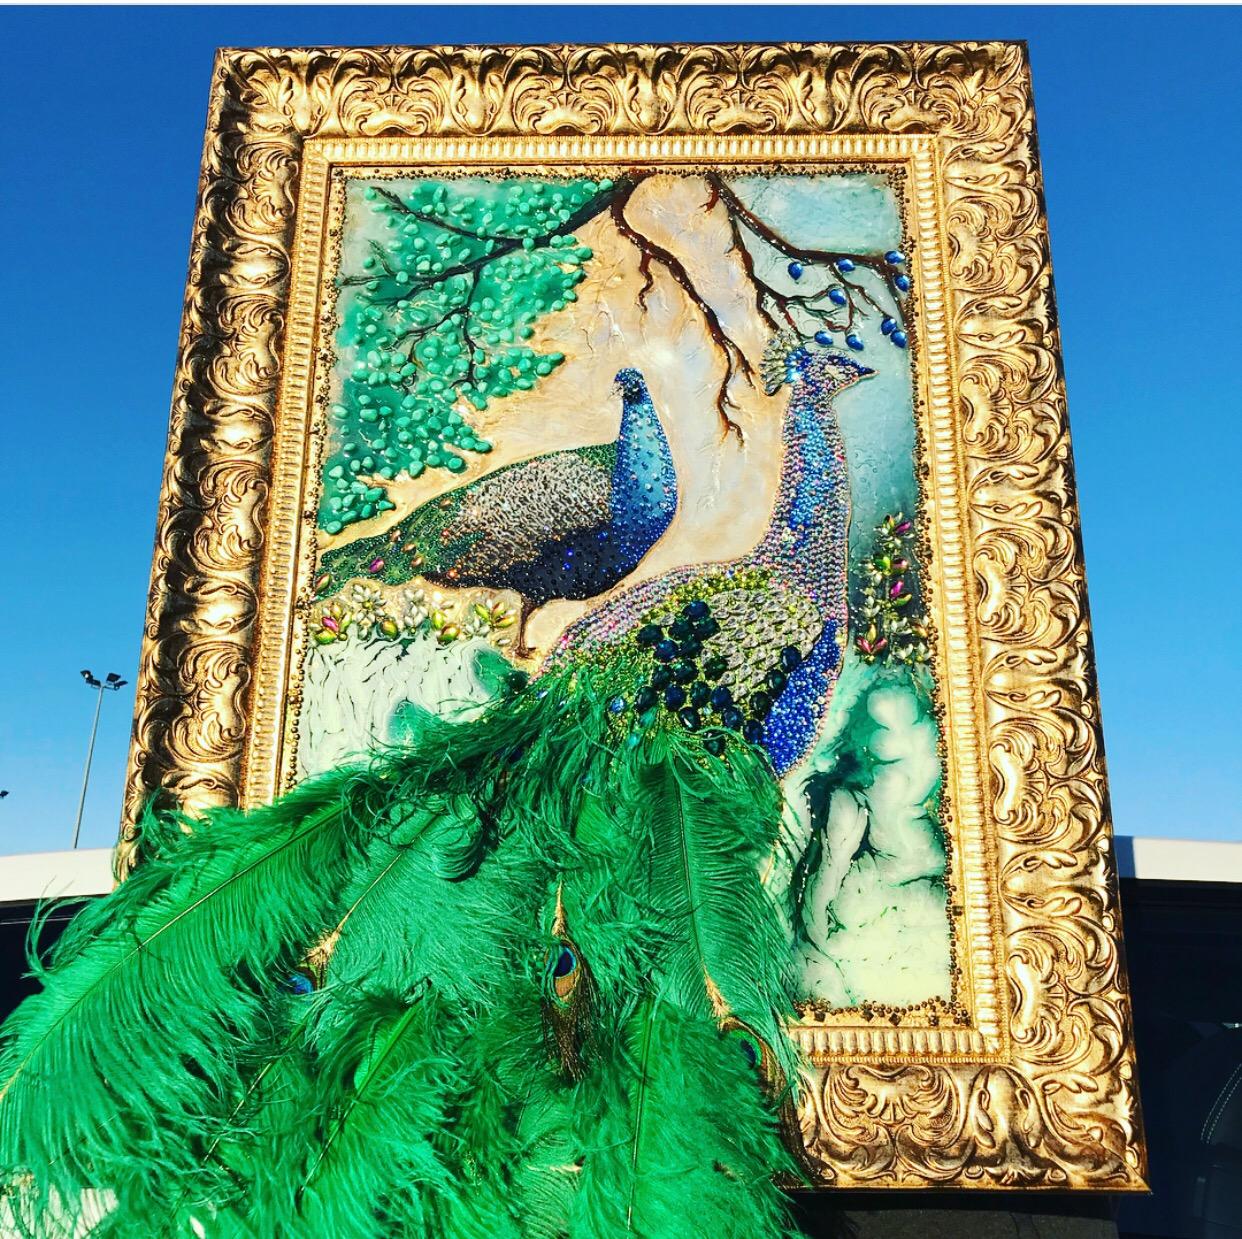 Embellished peacock art